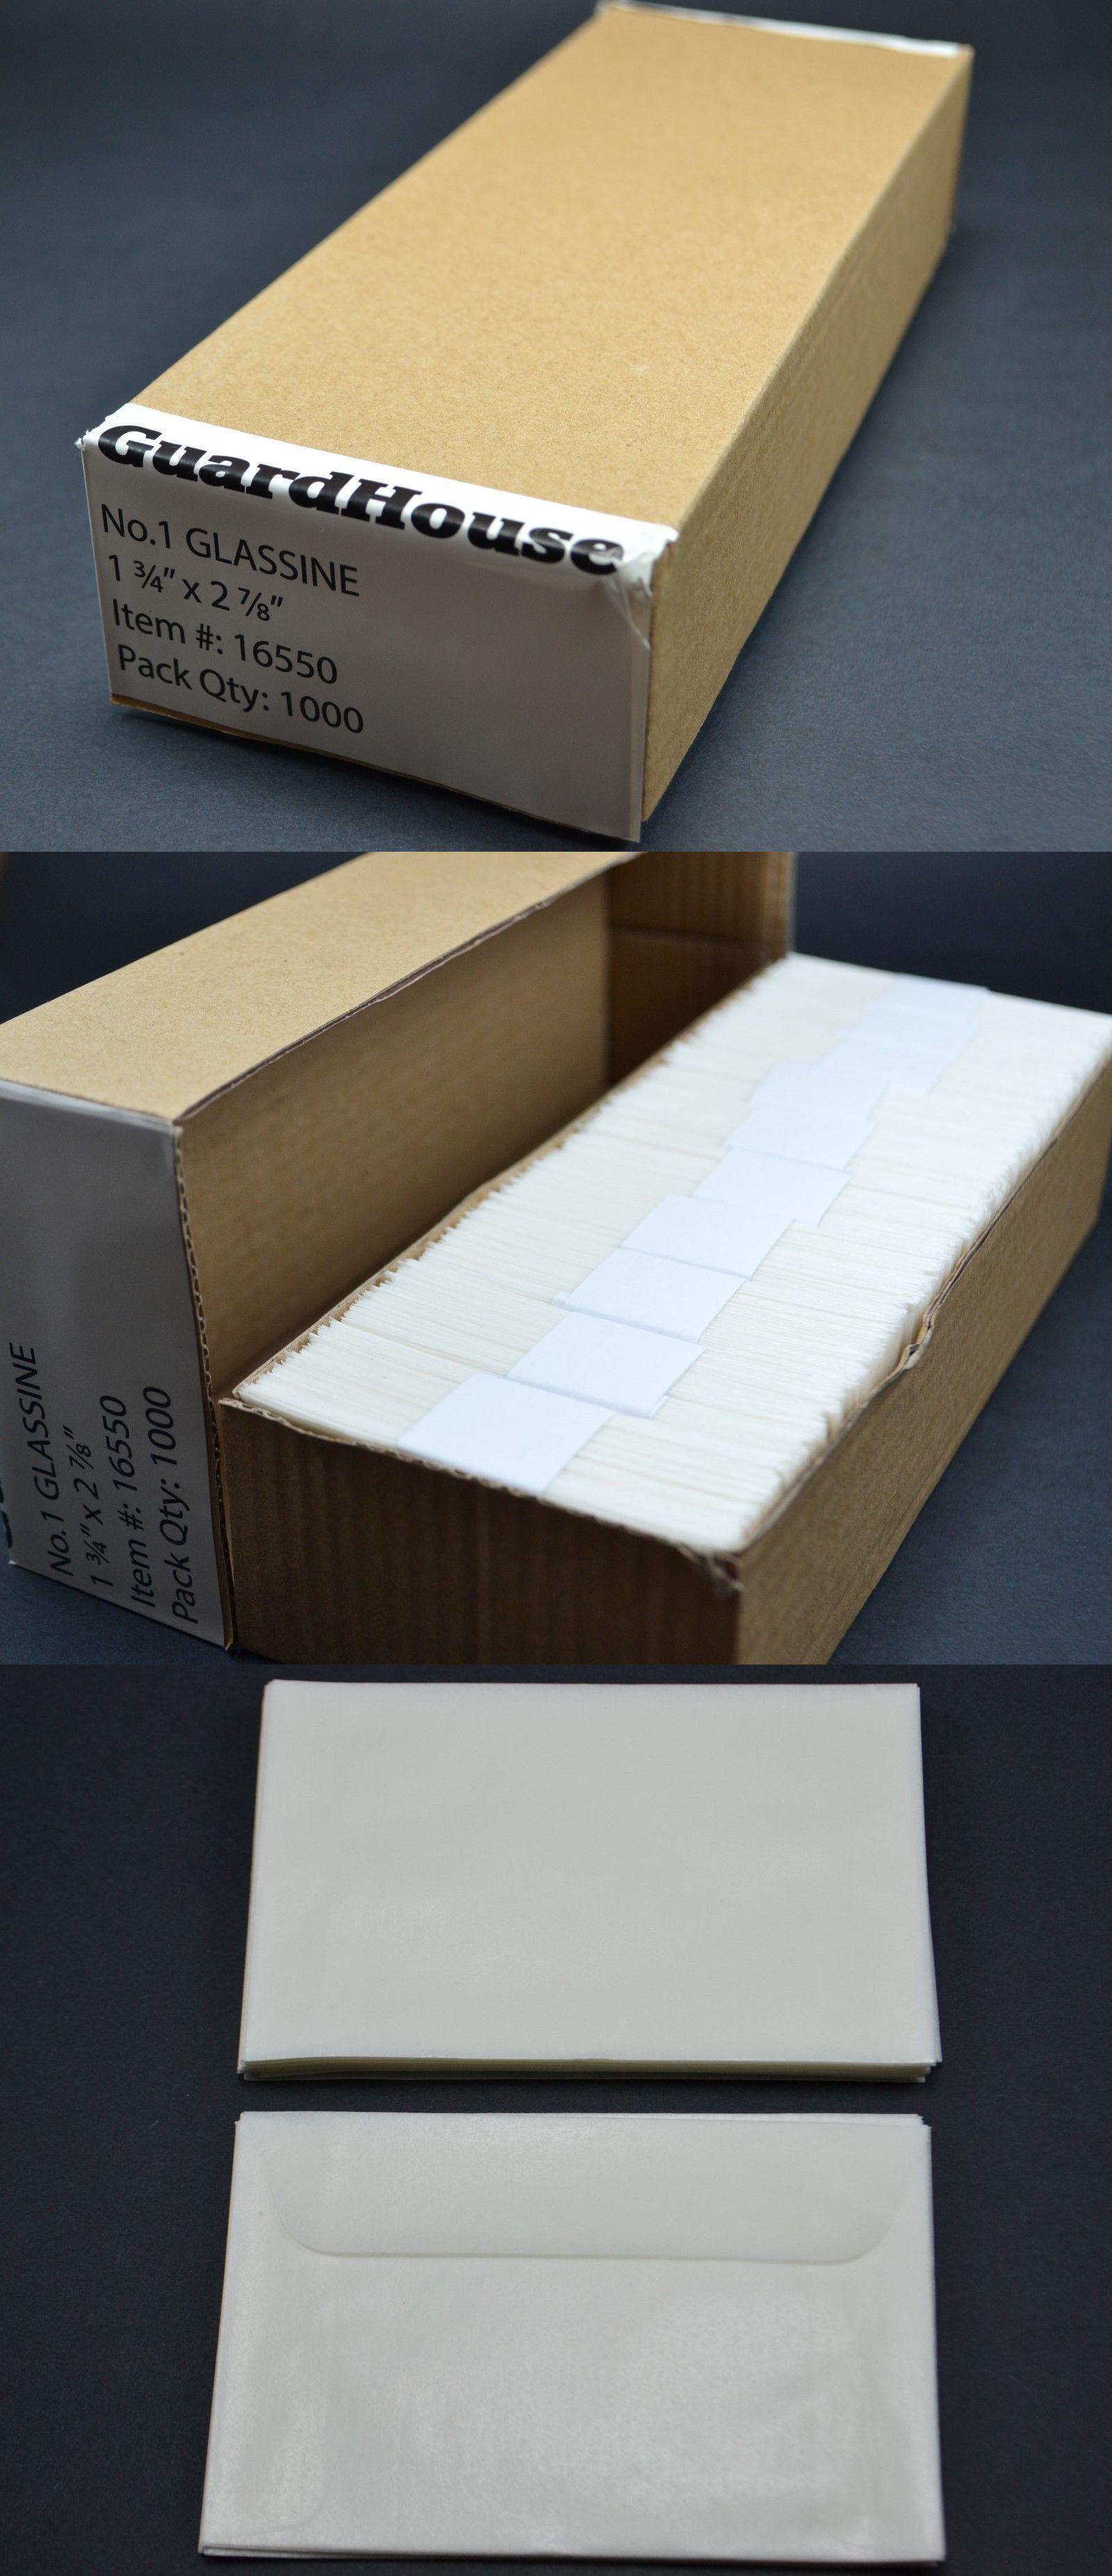 Guardhouse #4 Glassine Stamp Envelope Black Chipboard Storage Box